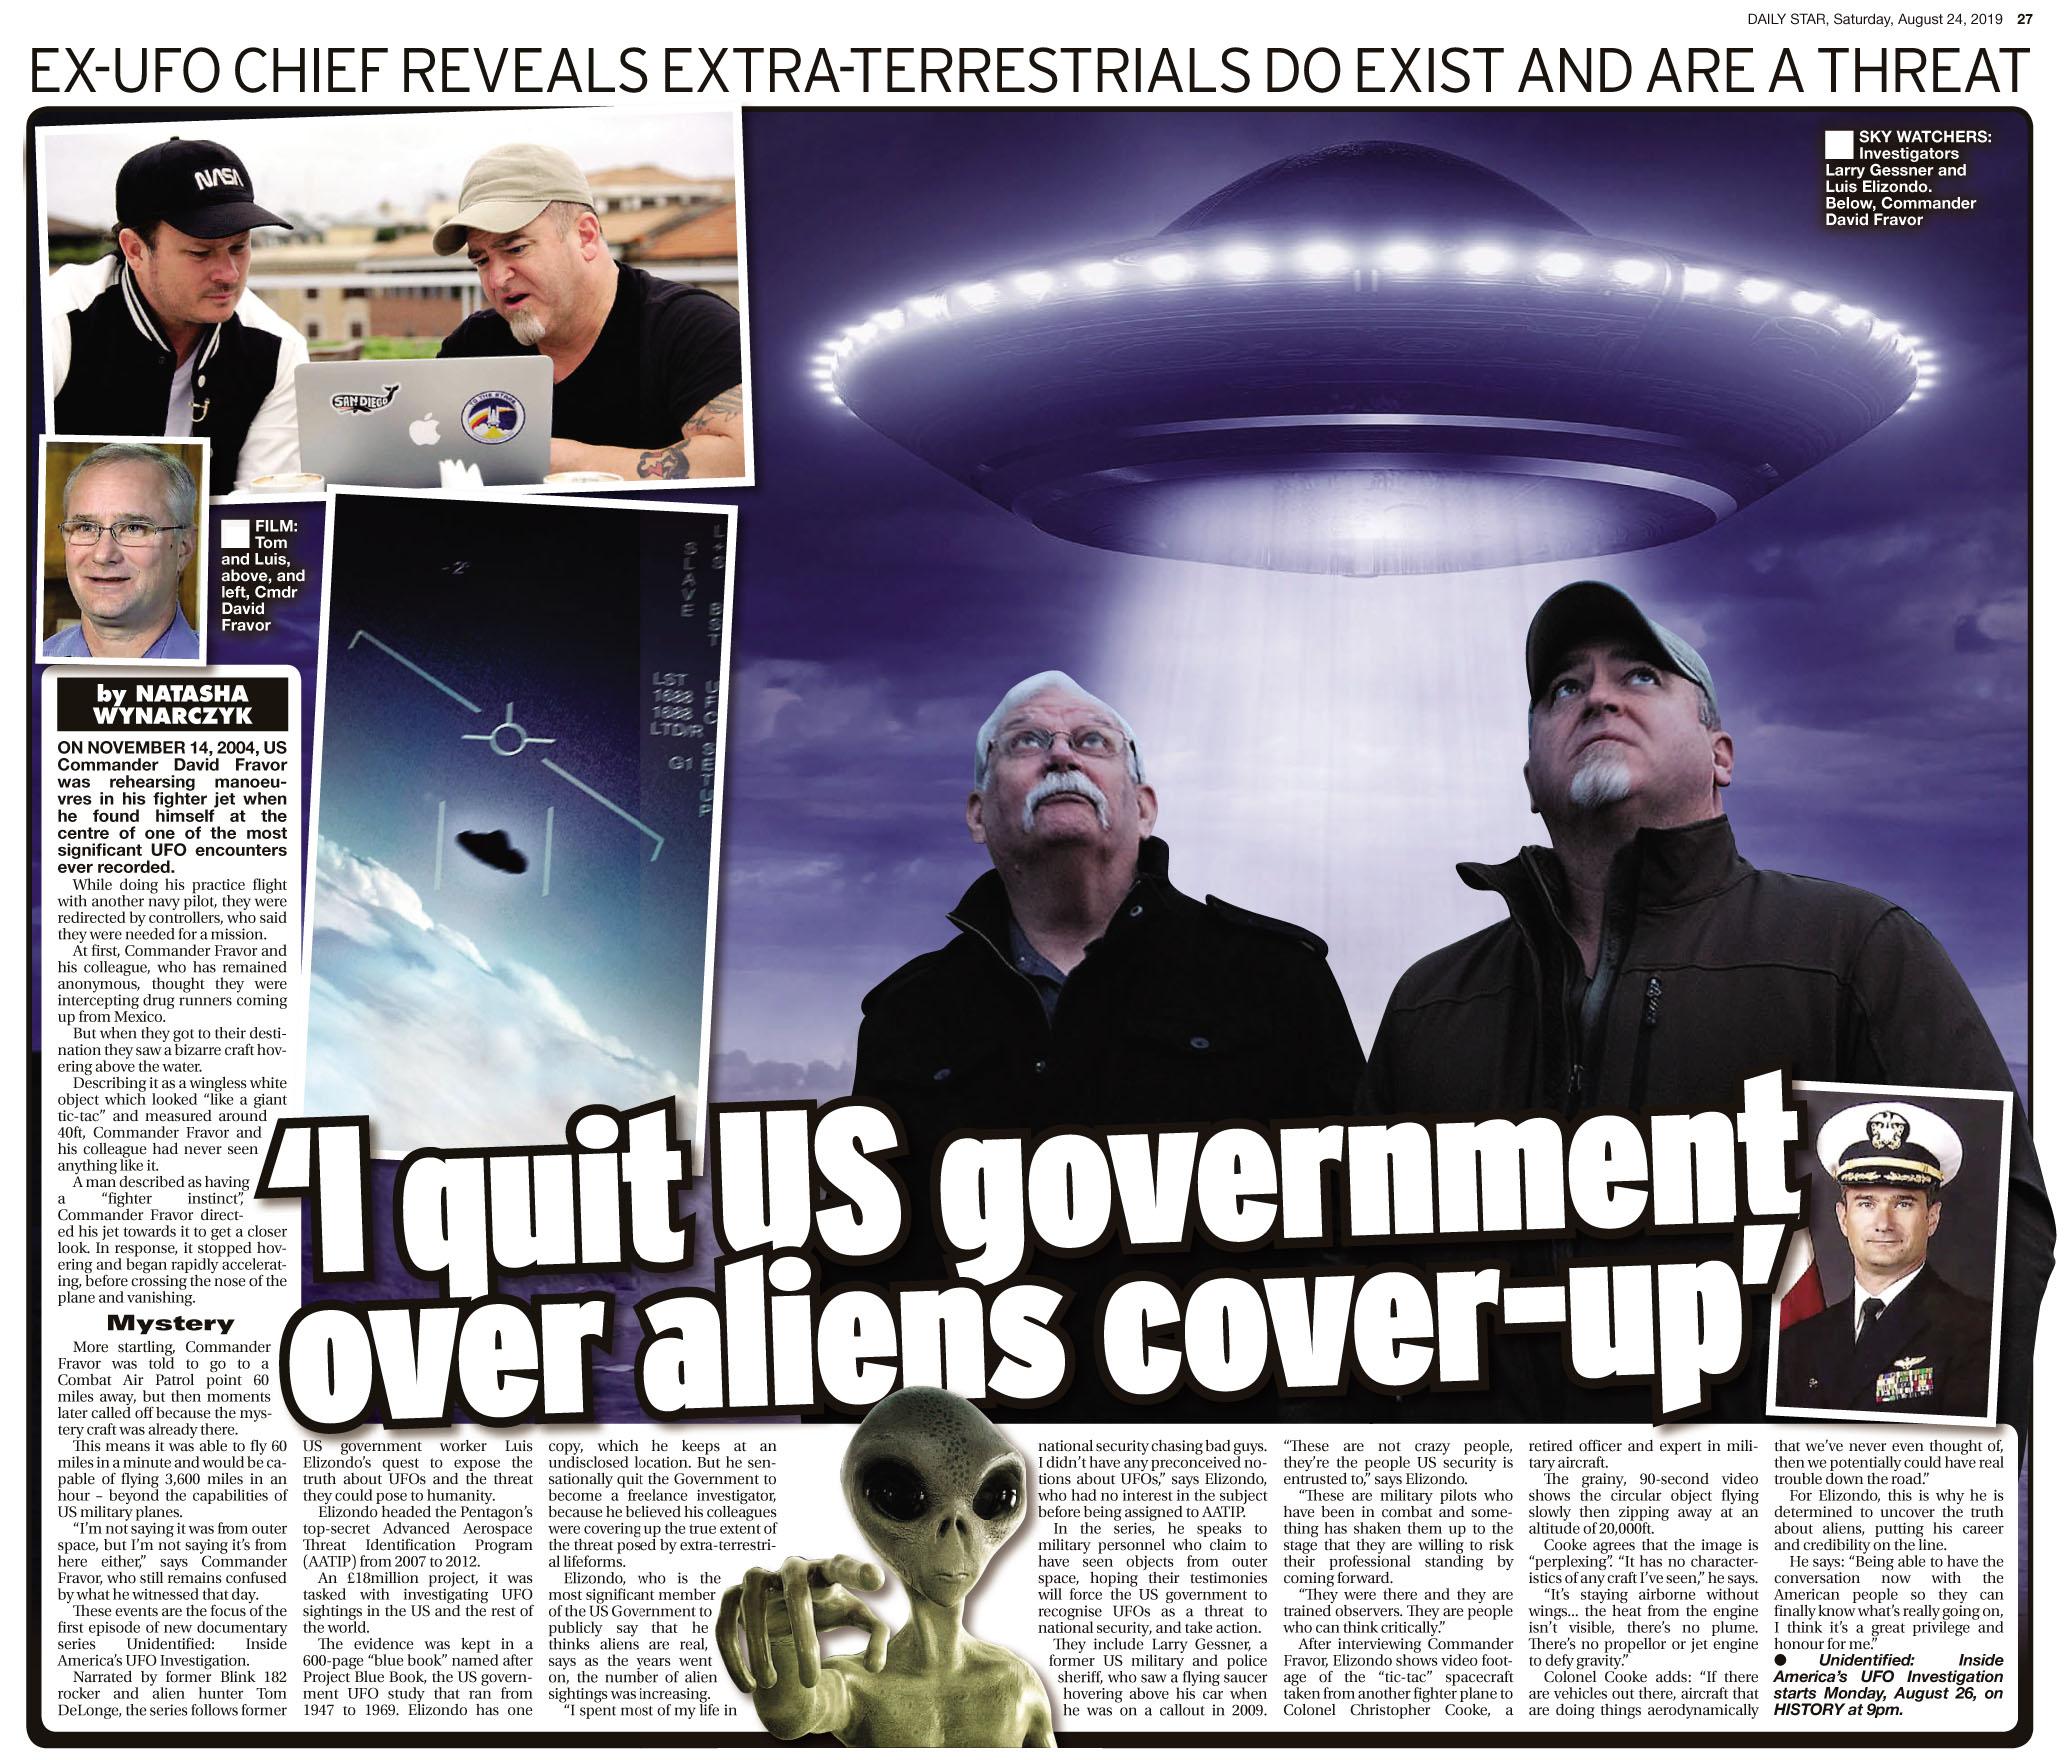 Daily Star 2019-08-24 UFO.jpg